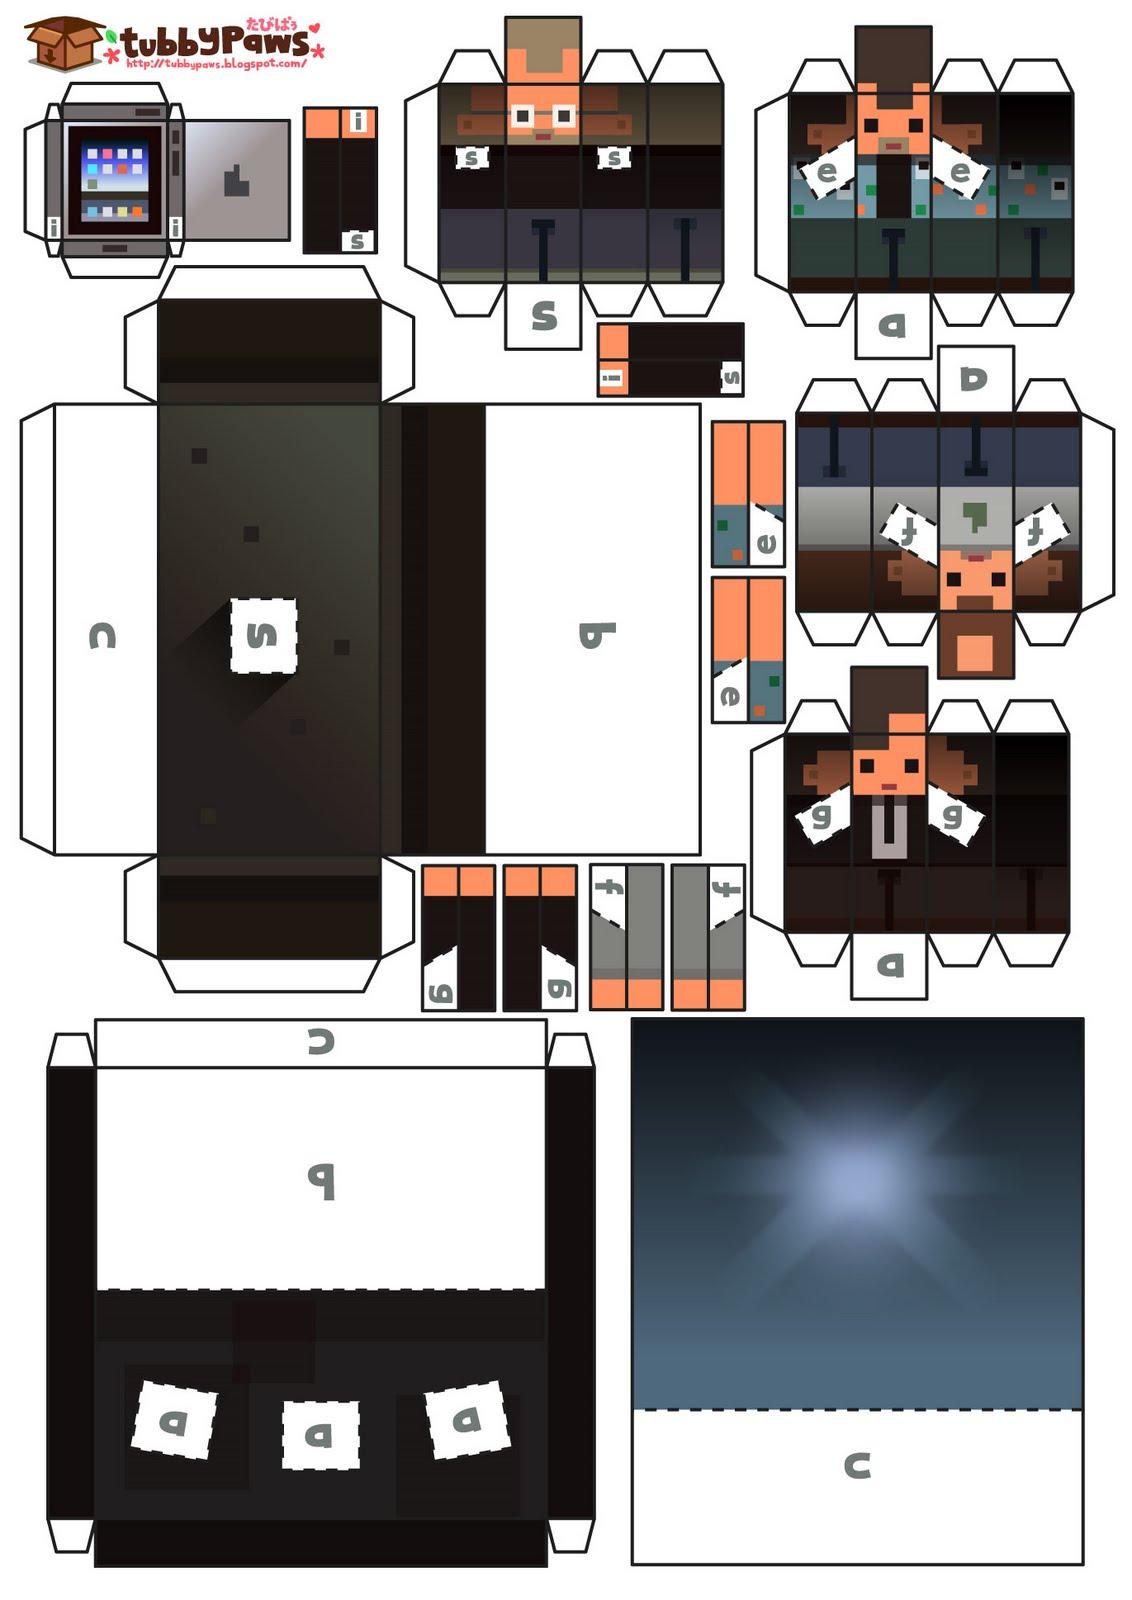 Steve Jobs Keynote Papercraft Template